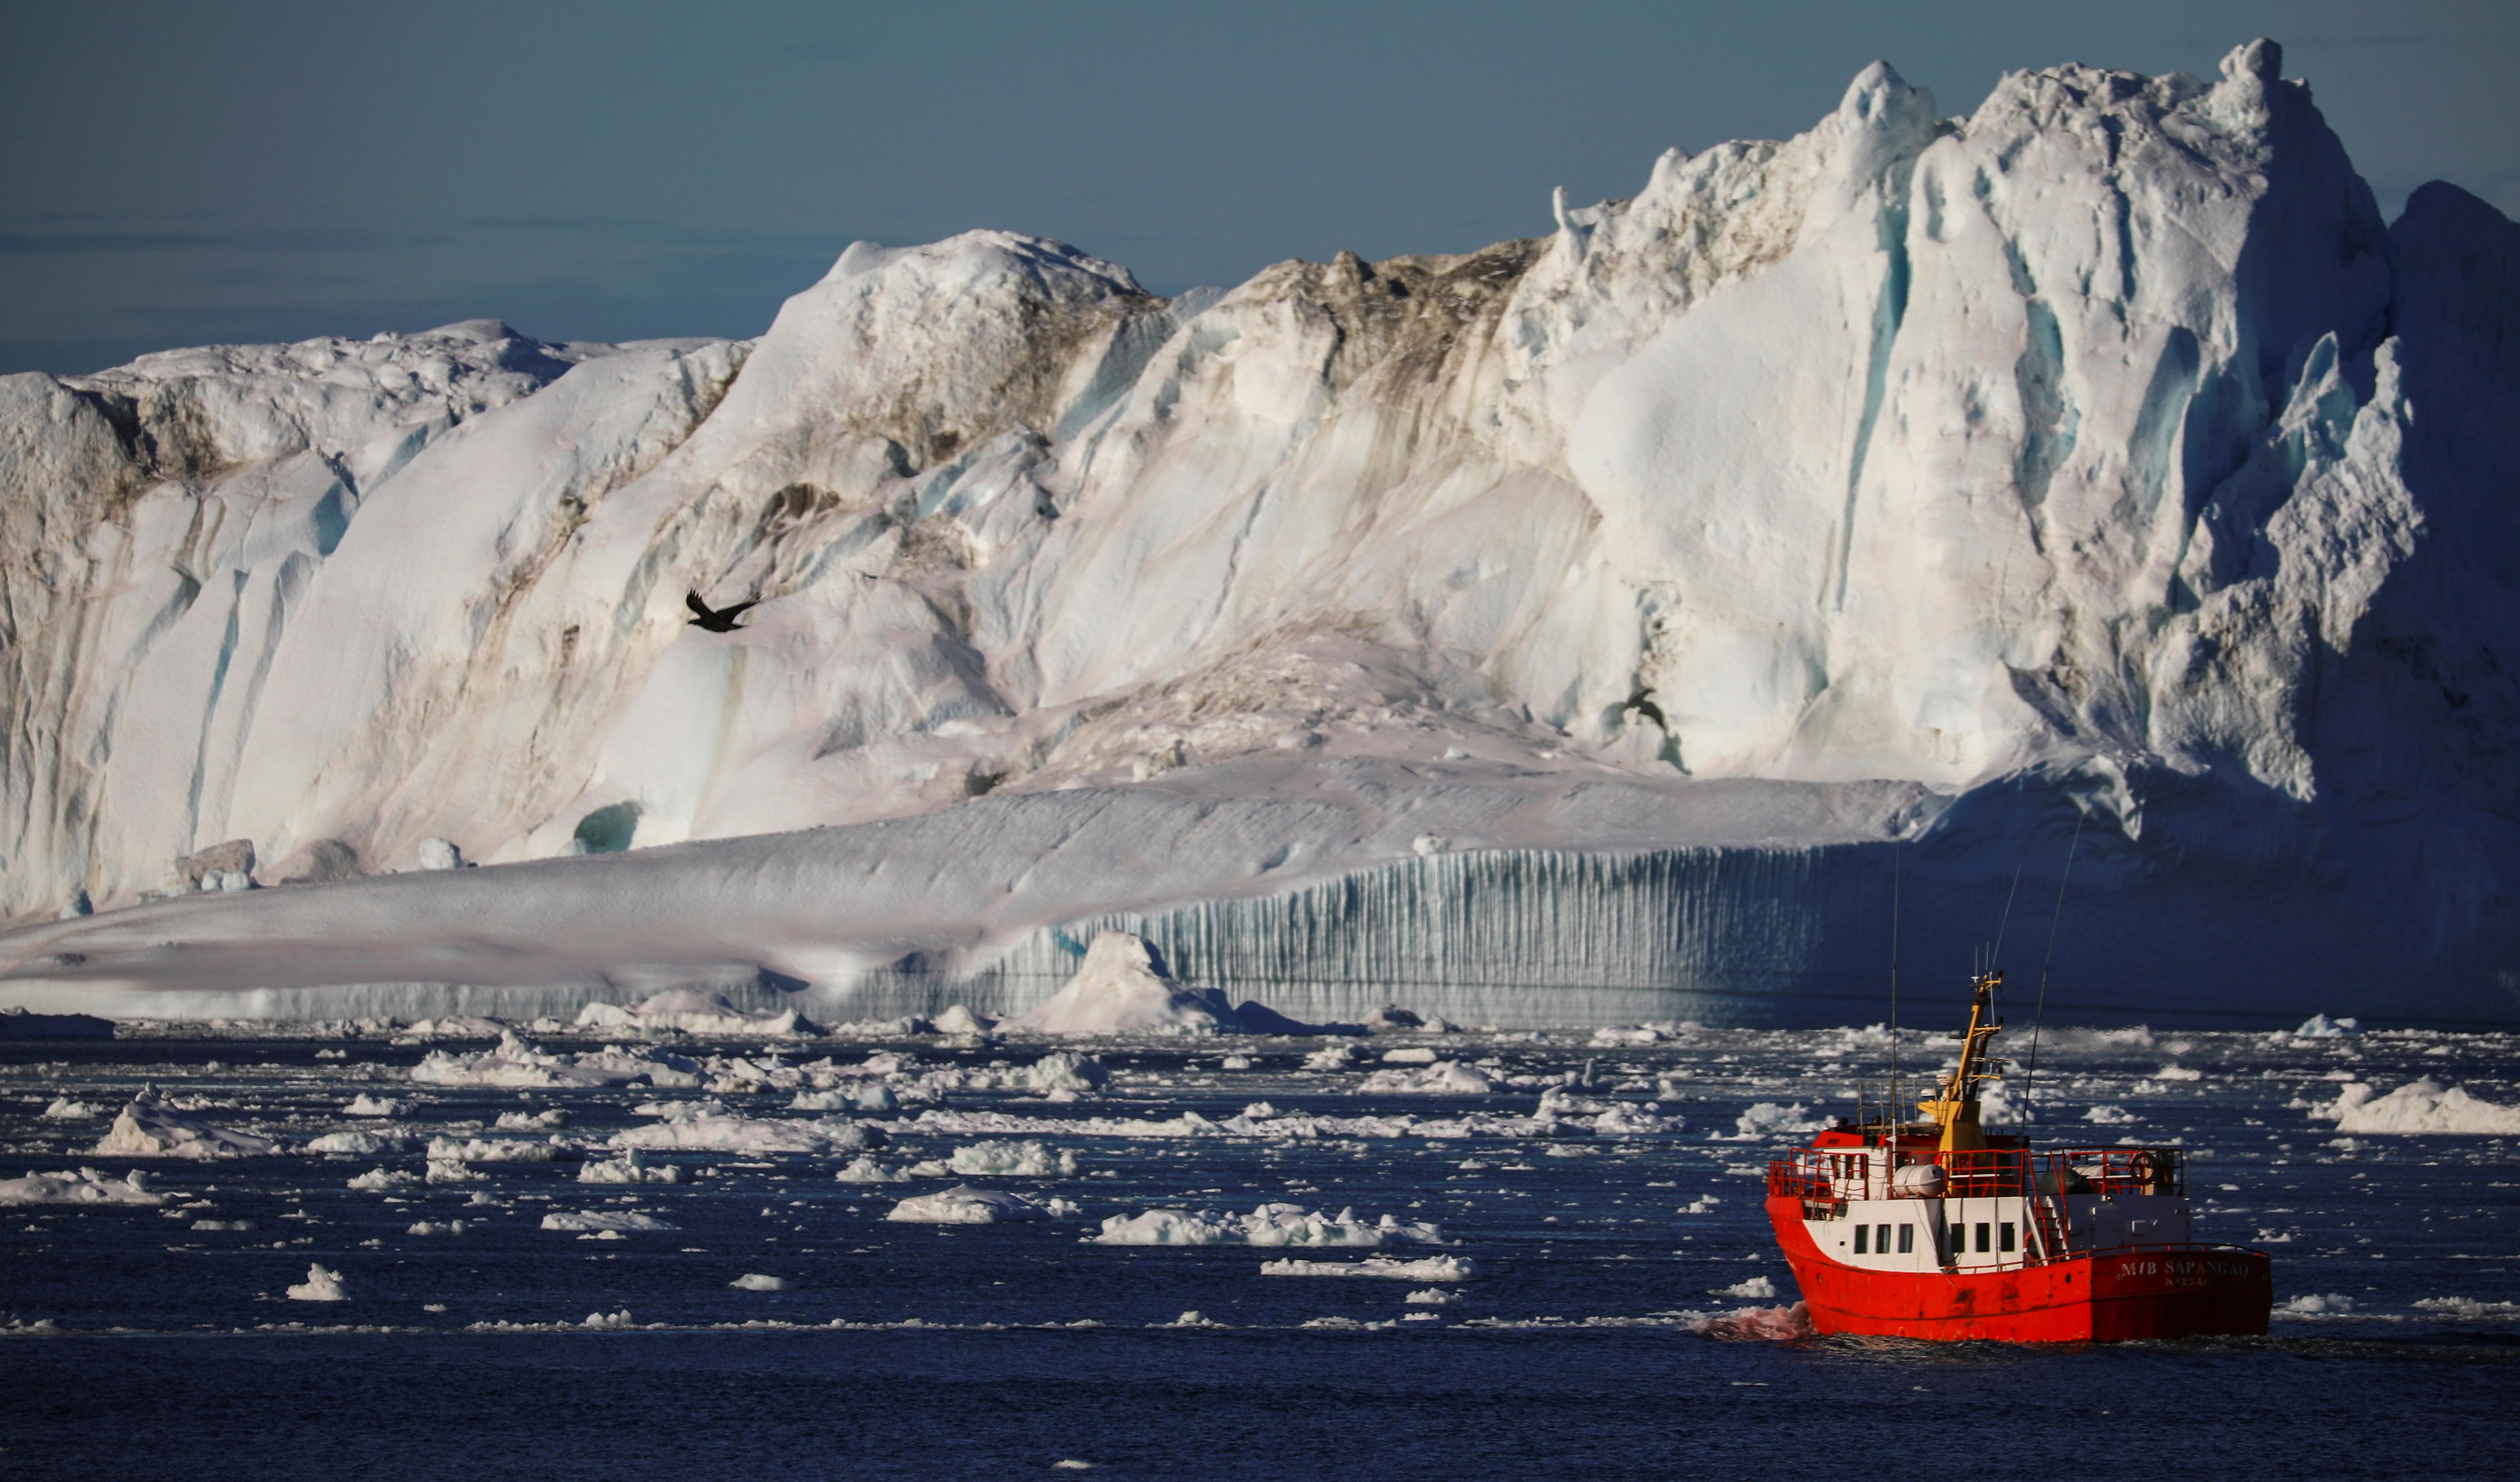 A boat passes icebergs at the Disko Bay near Ilulissat, Greenland, September 16. REUTERS/Hannibal Hanschke/File Photo